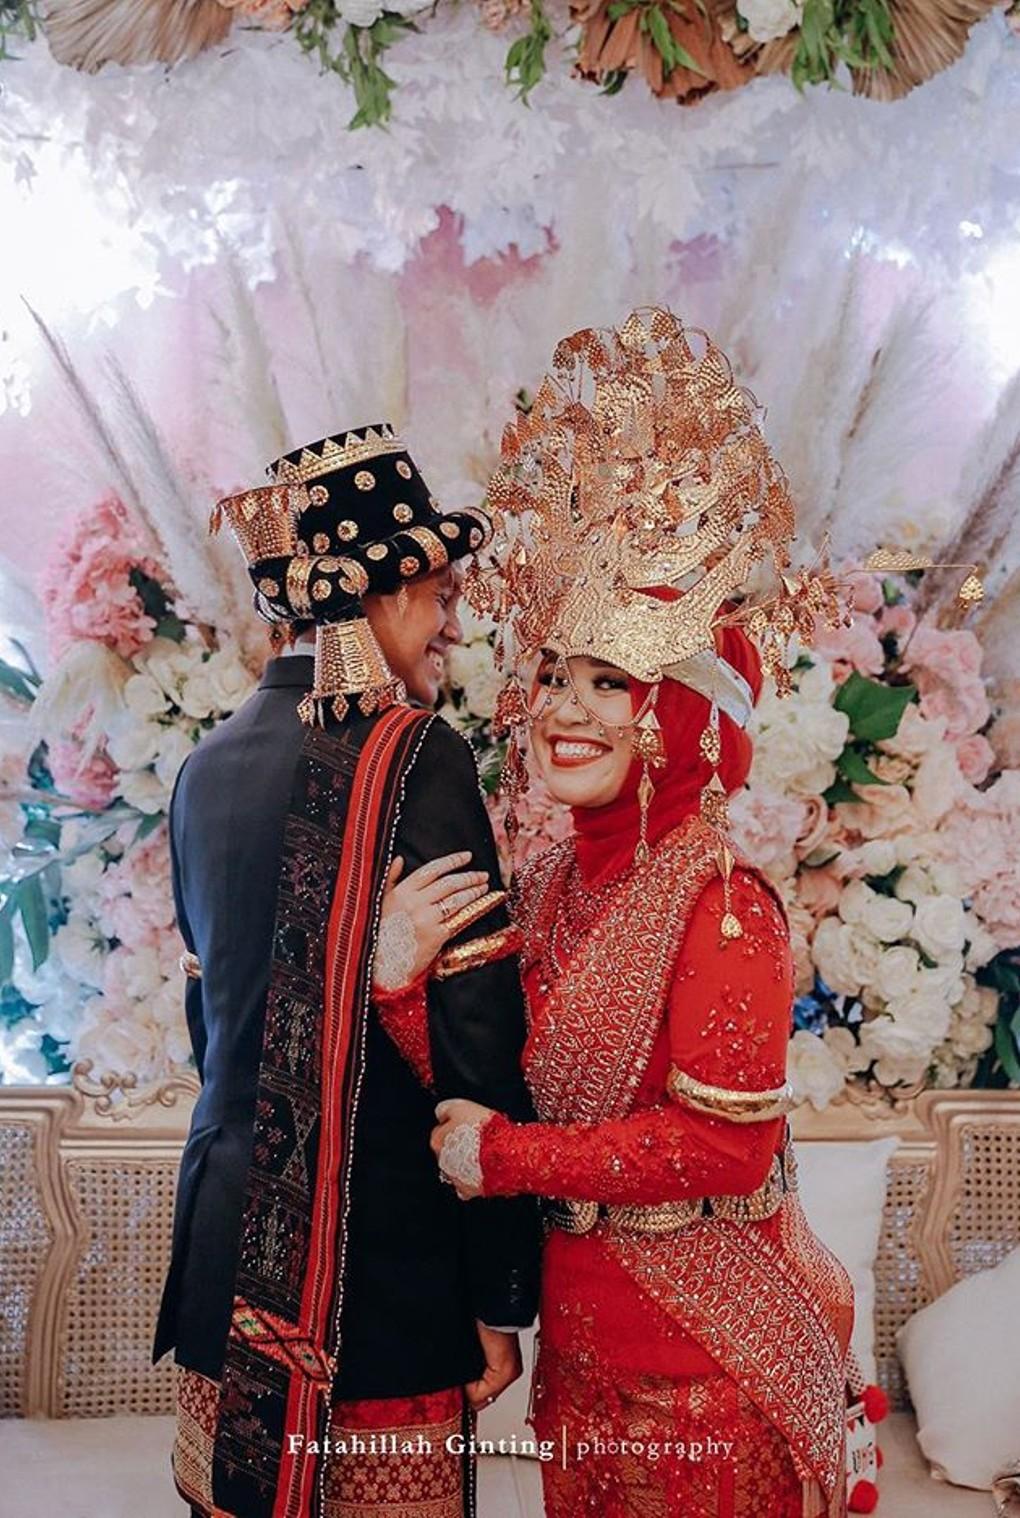 Marina Maitland - Wedding Dress: Wedding Dress Hijab Red